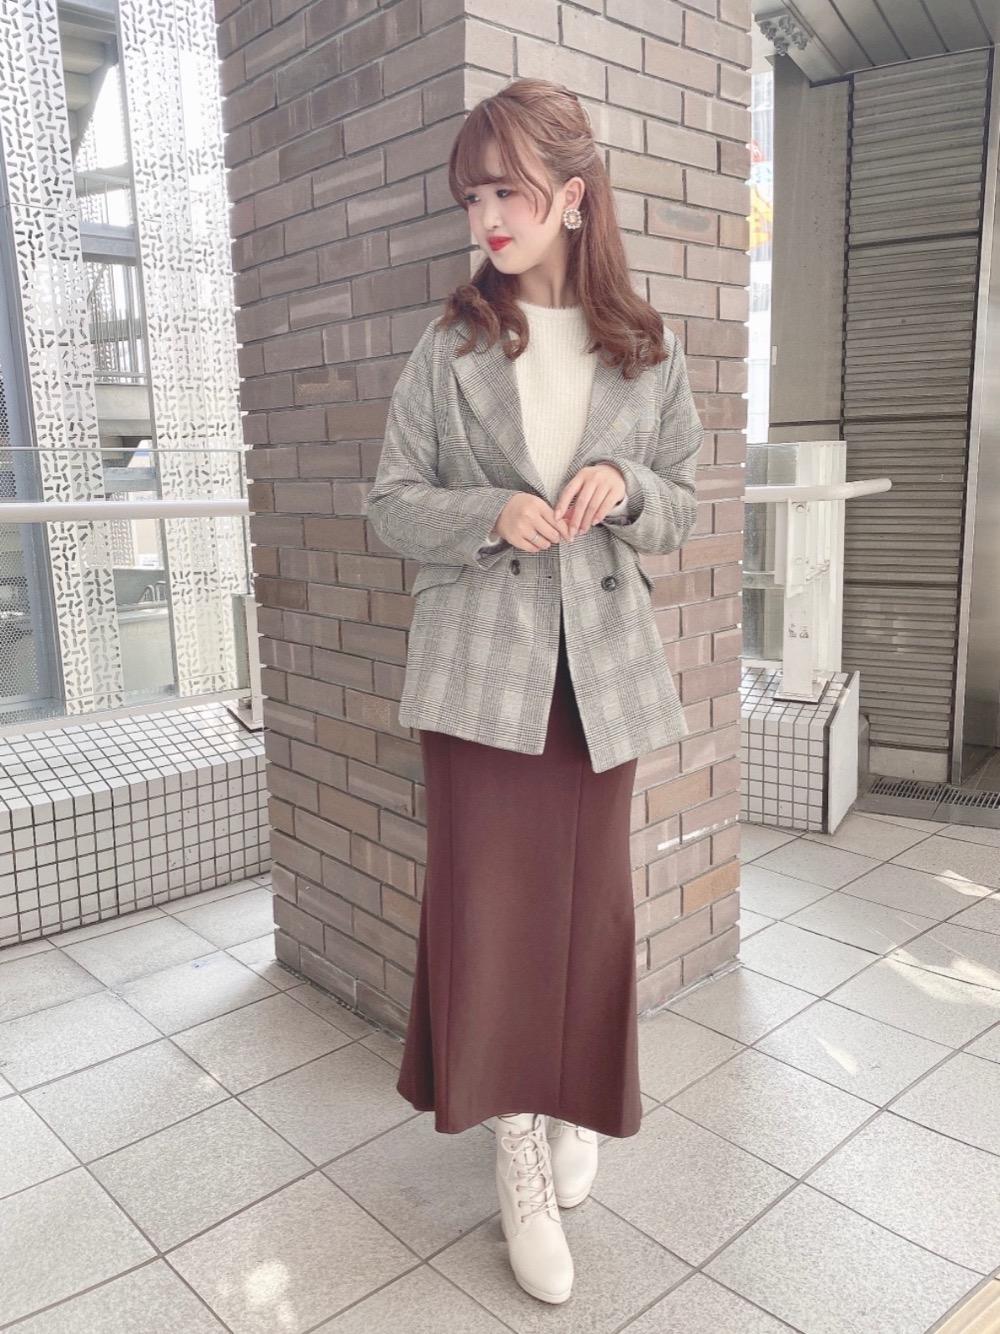 MAJESTIC LEGONさんすて岡山店